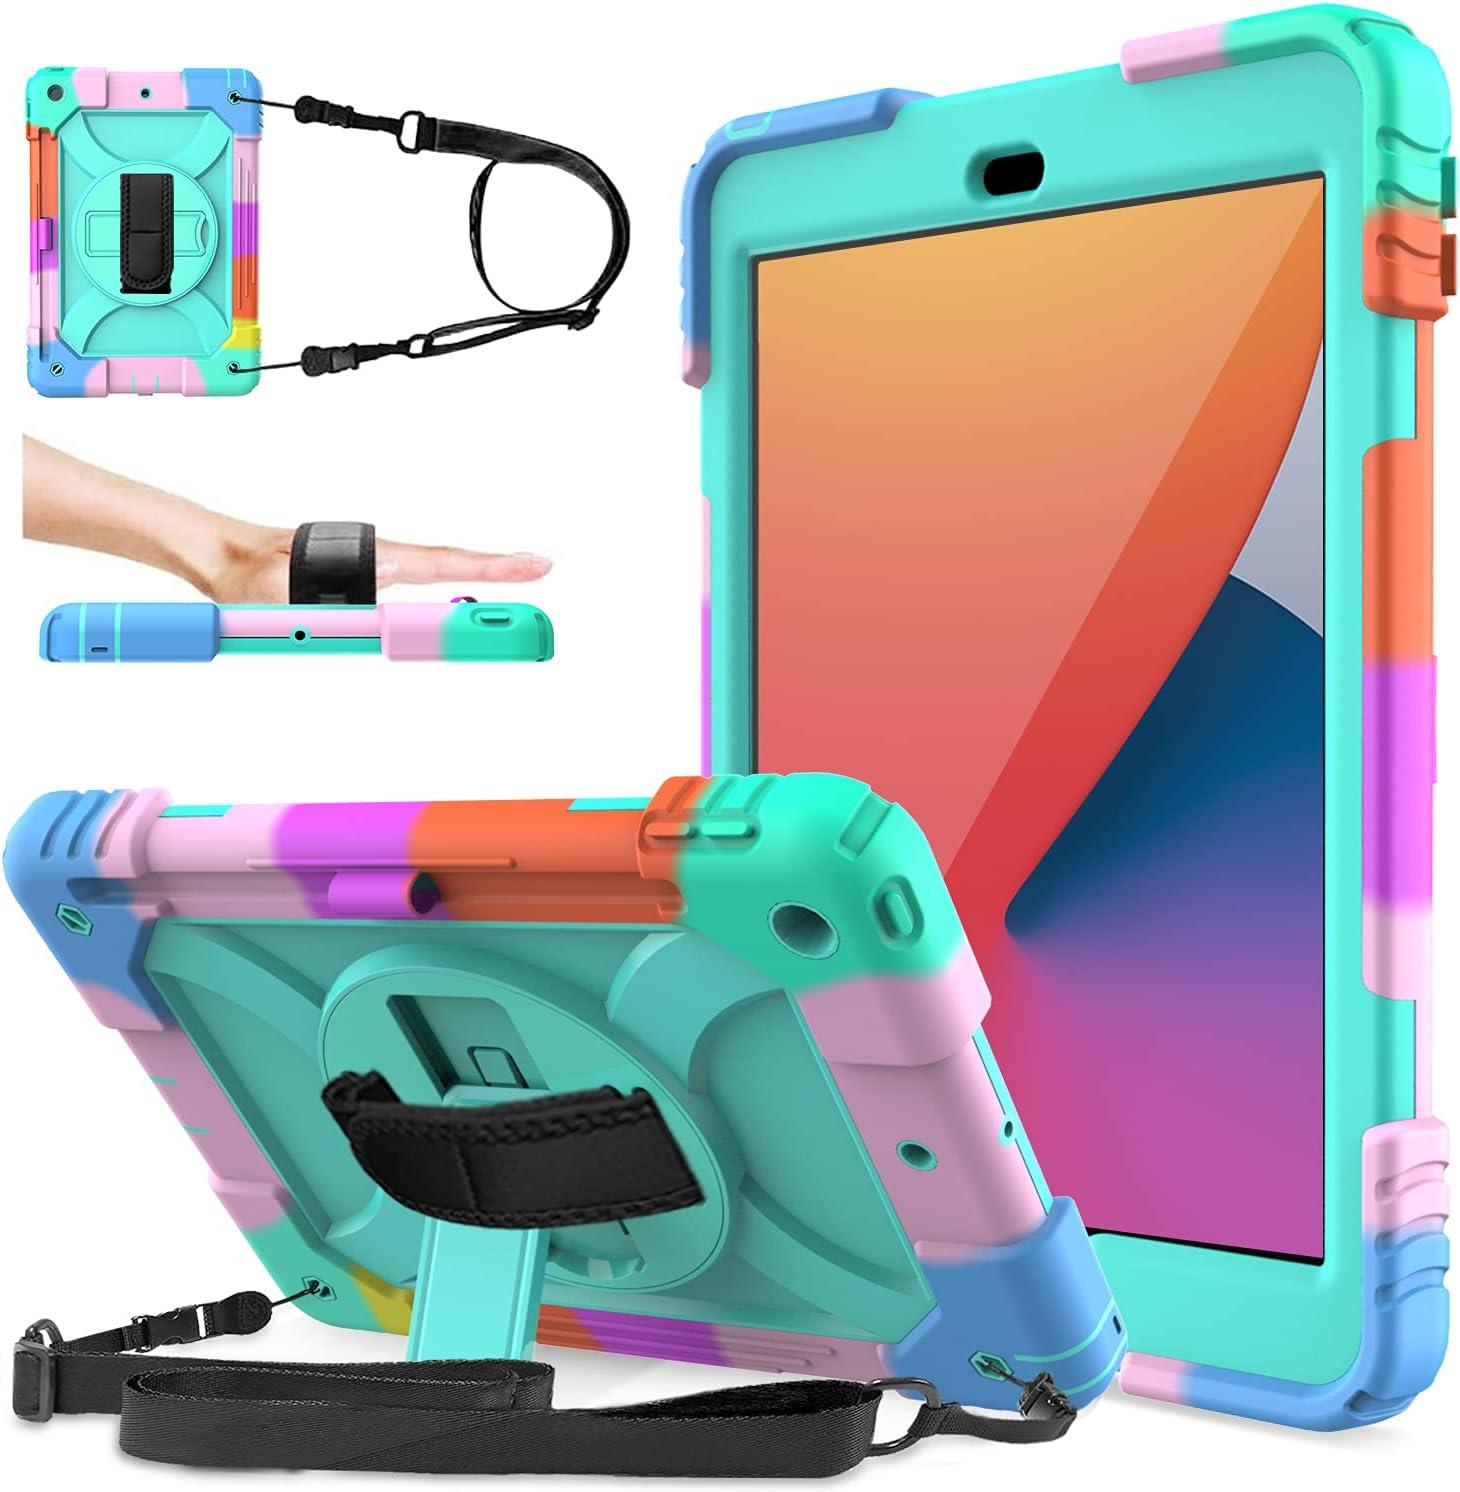 LEDNICEKER iPad Minneapolis Mall 9th 8th 7th 10.2 Thr 2021 model Generation case